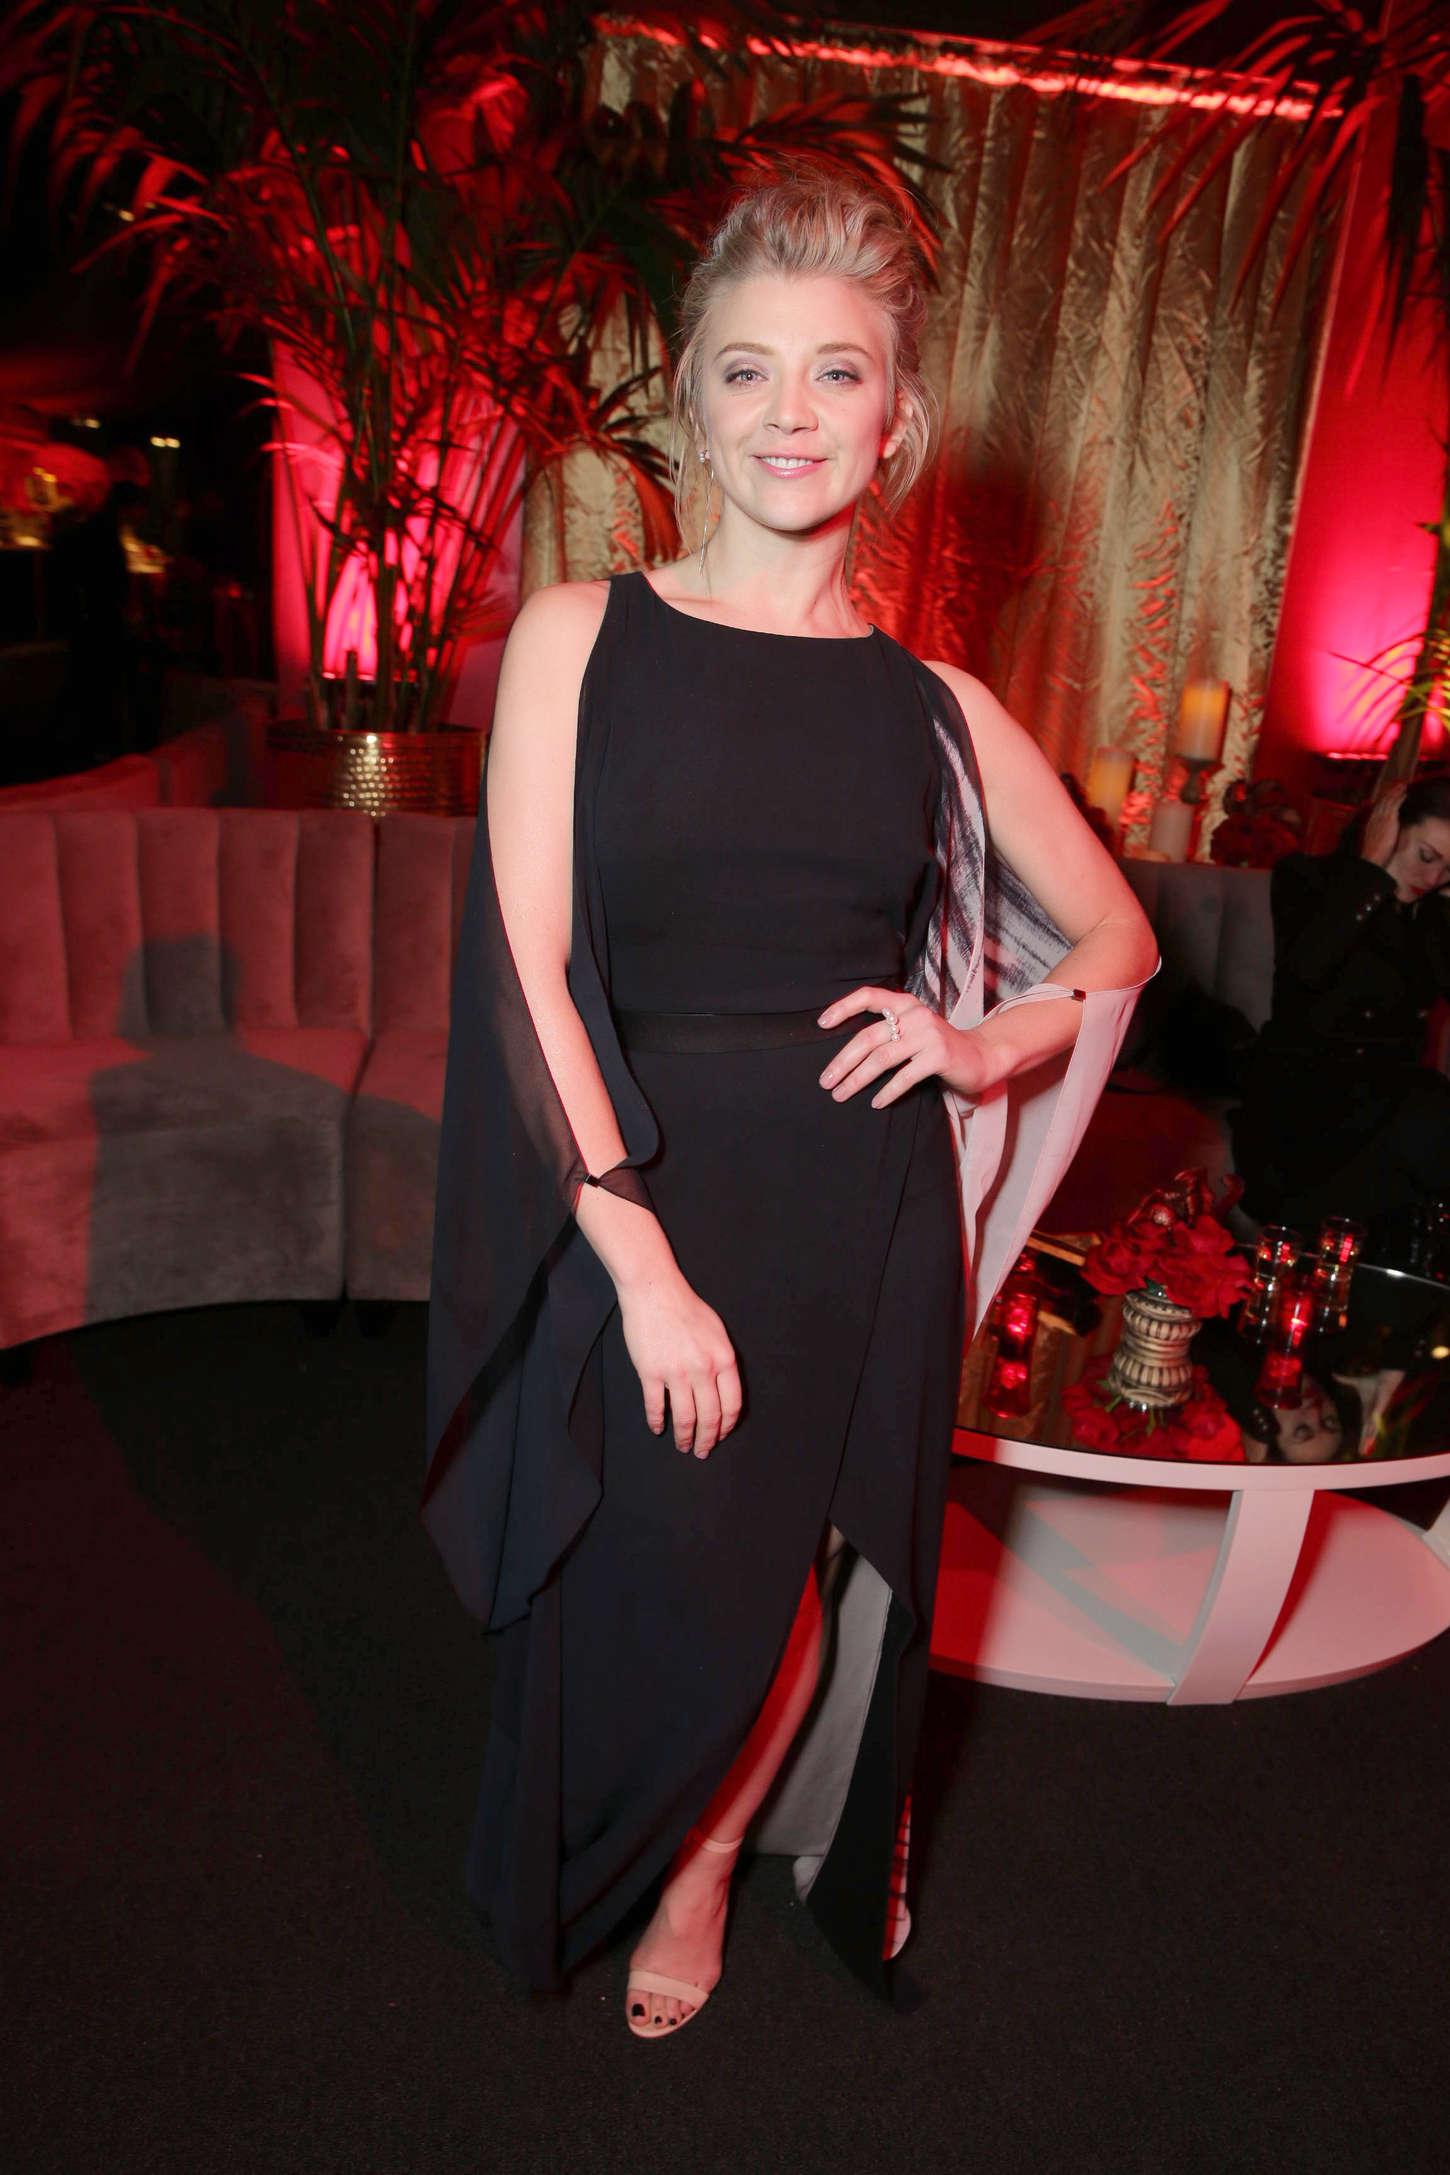 Natalie Dormer - 'The Hunger Games: Mockingjay' Part 2' Premiere After Party in LA